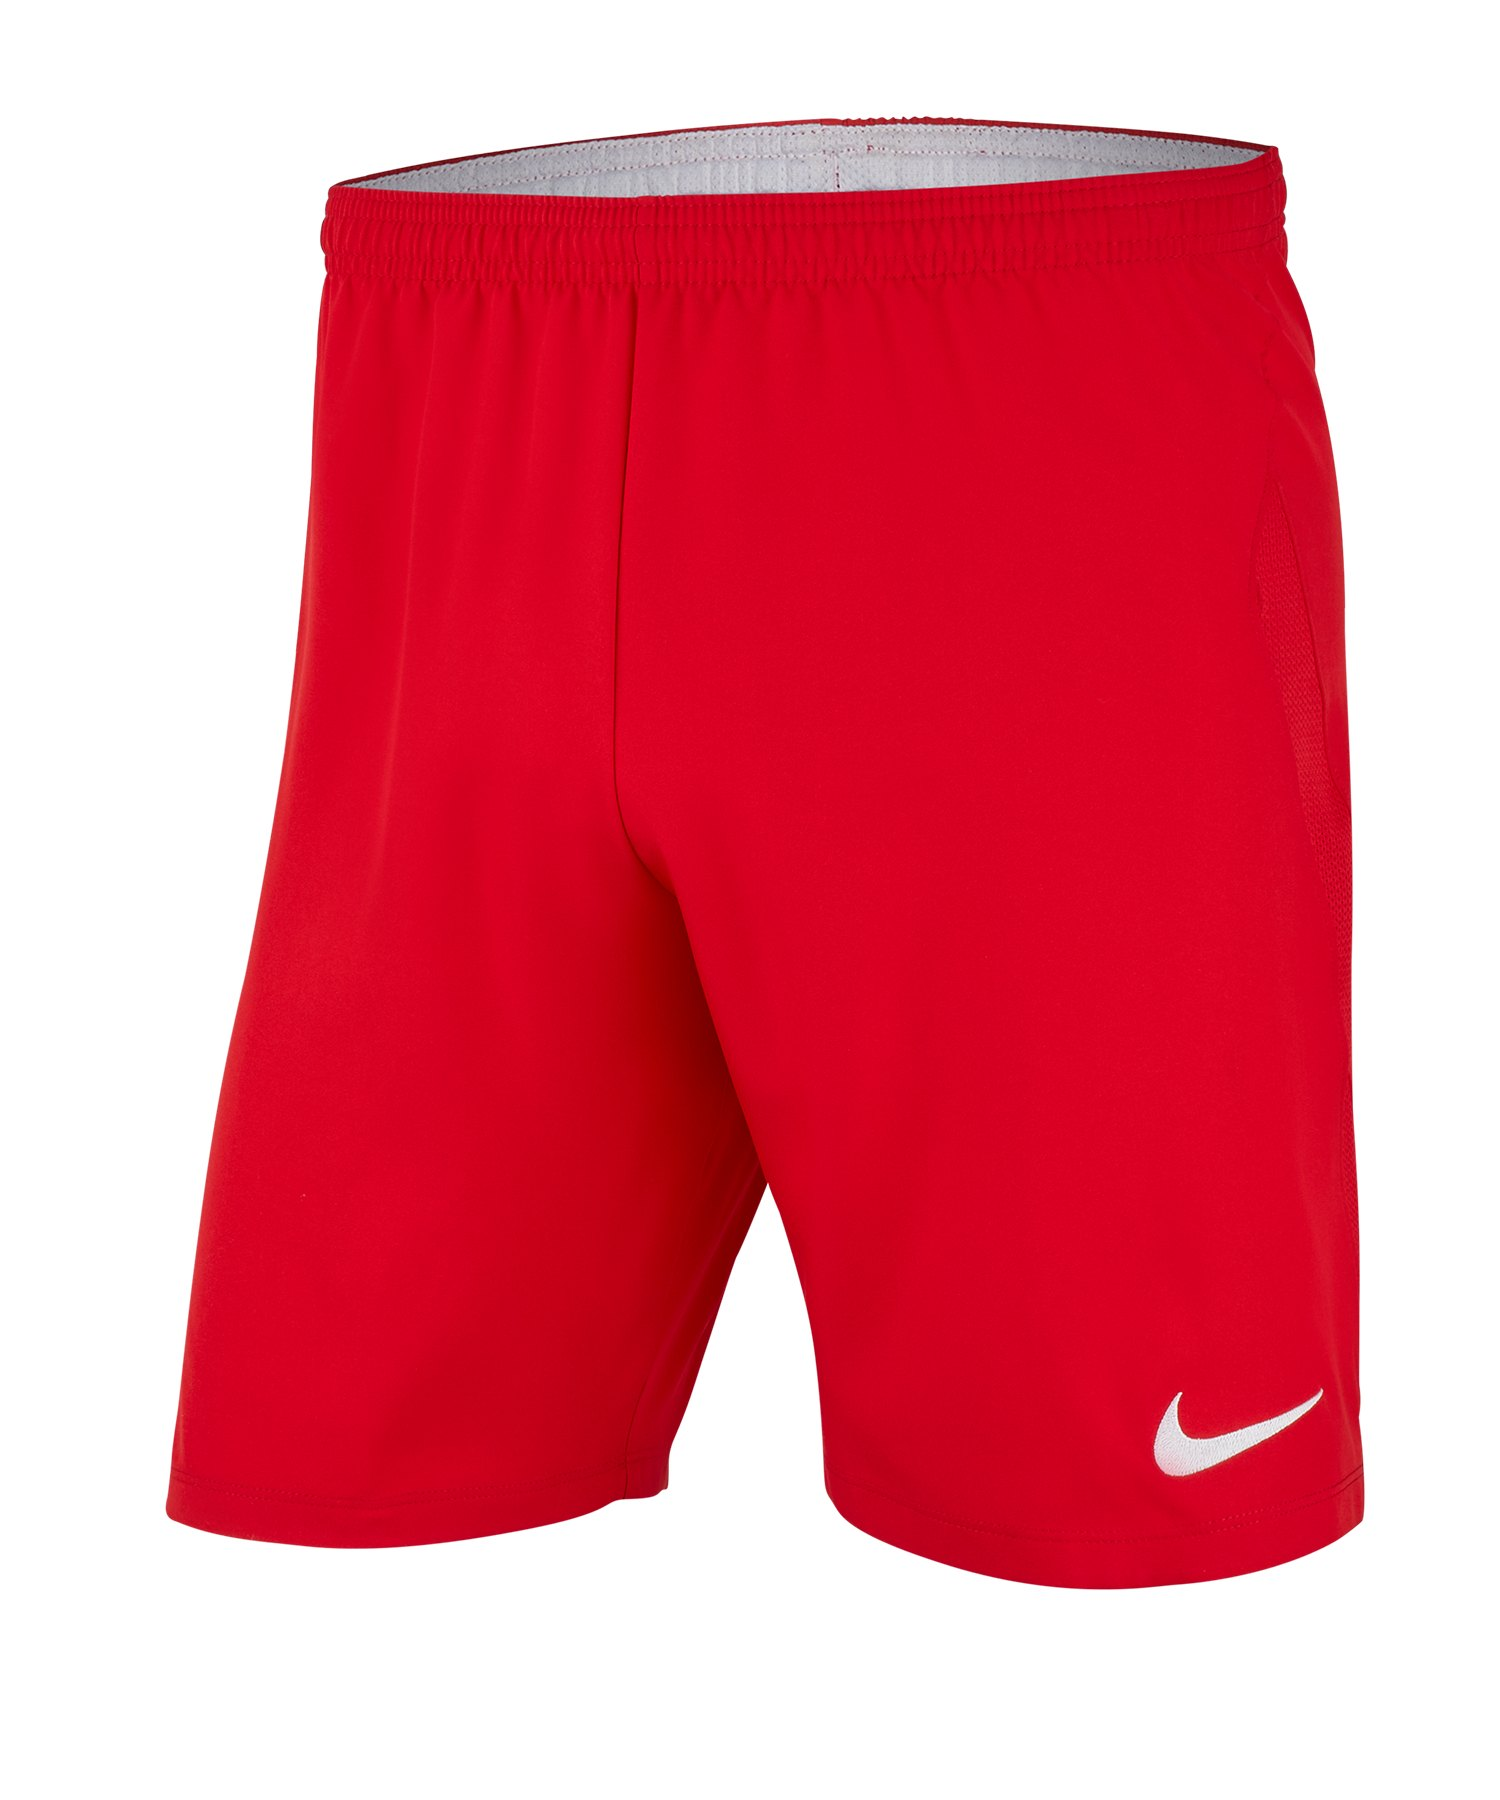 Nike Laser IV Woven Short Rot F657 - rot